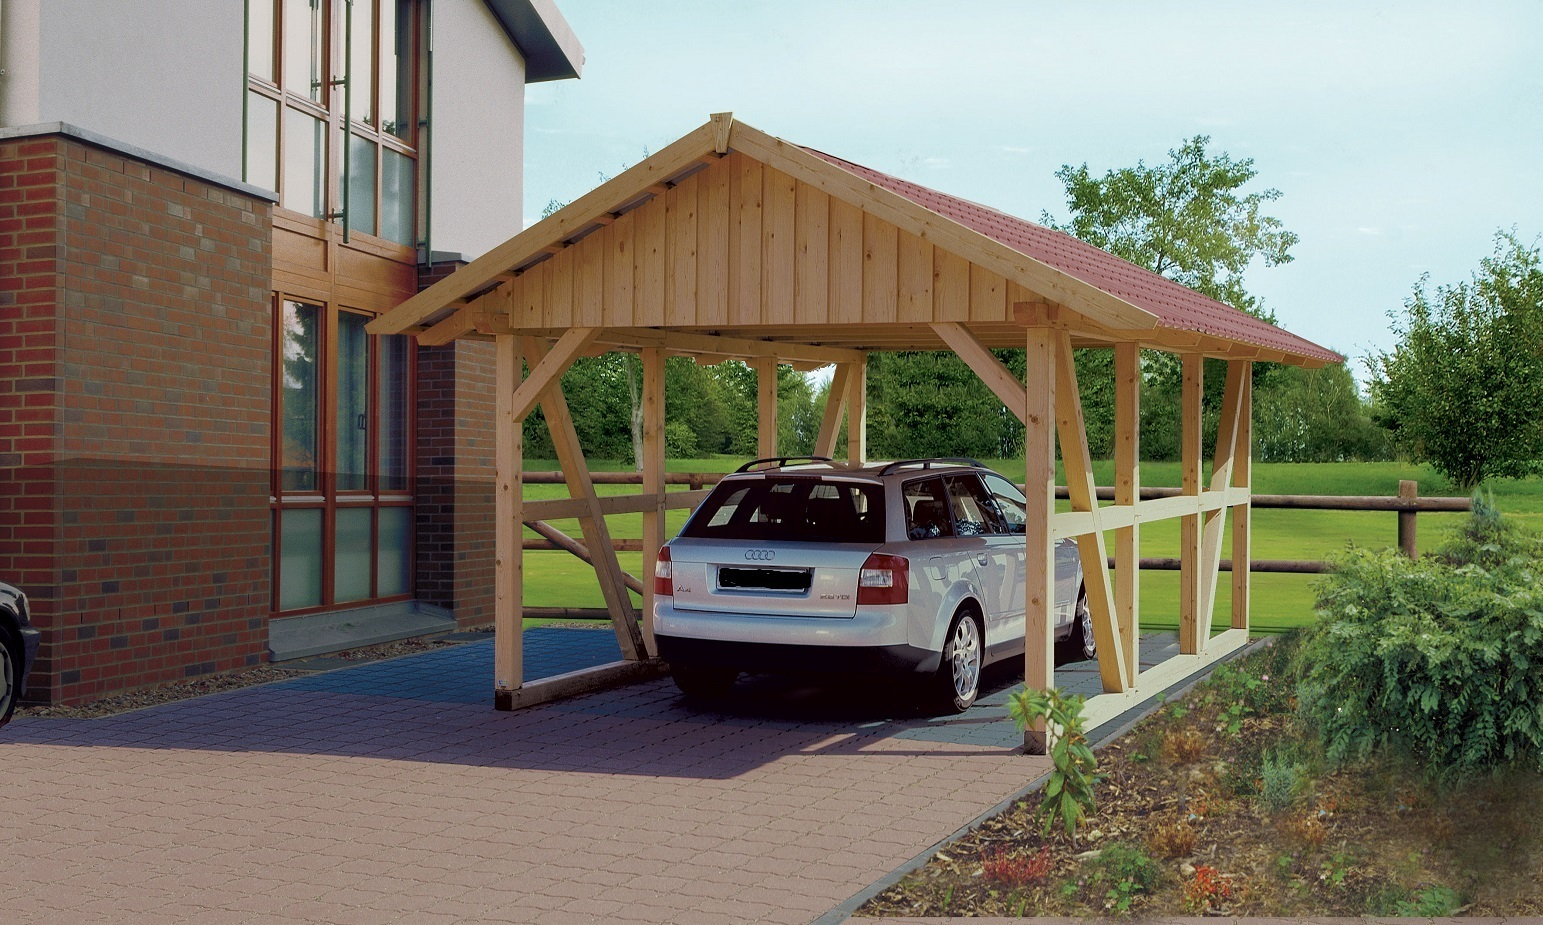 Fachwerk carport neu mit spitzdach sams gartenhaus shop for Montageanleitung carport